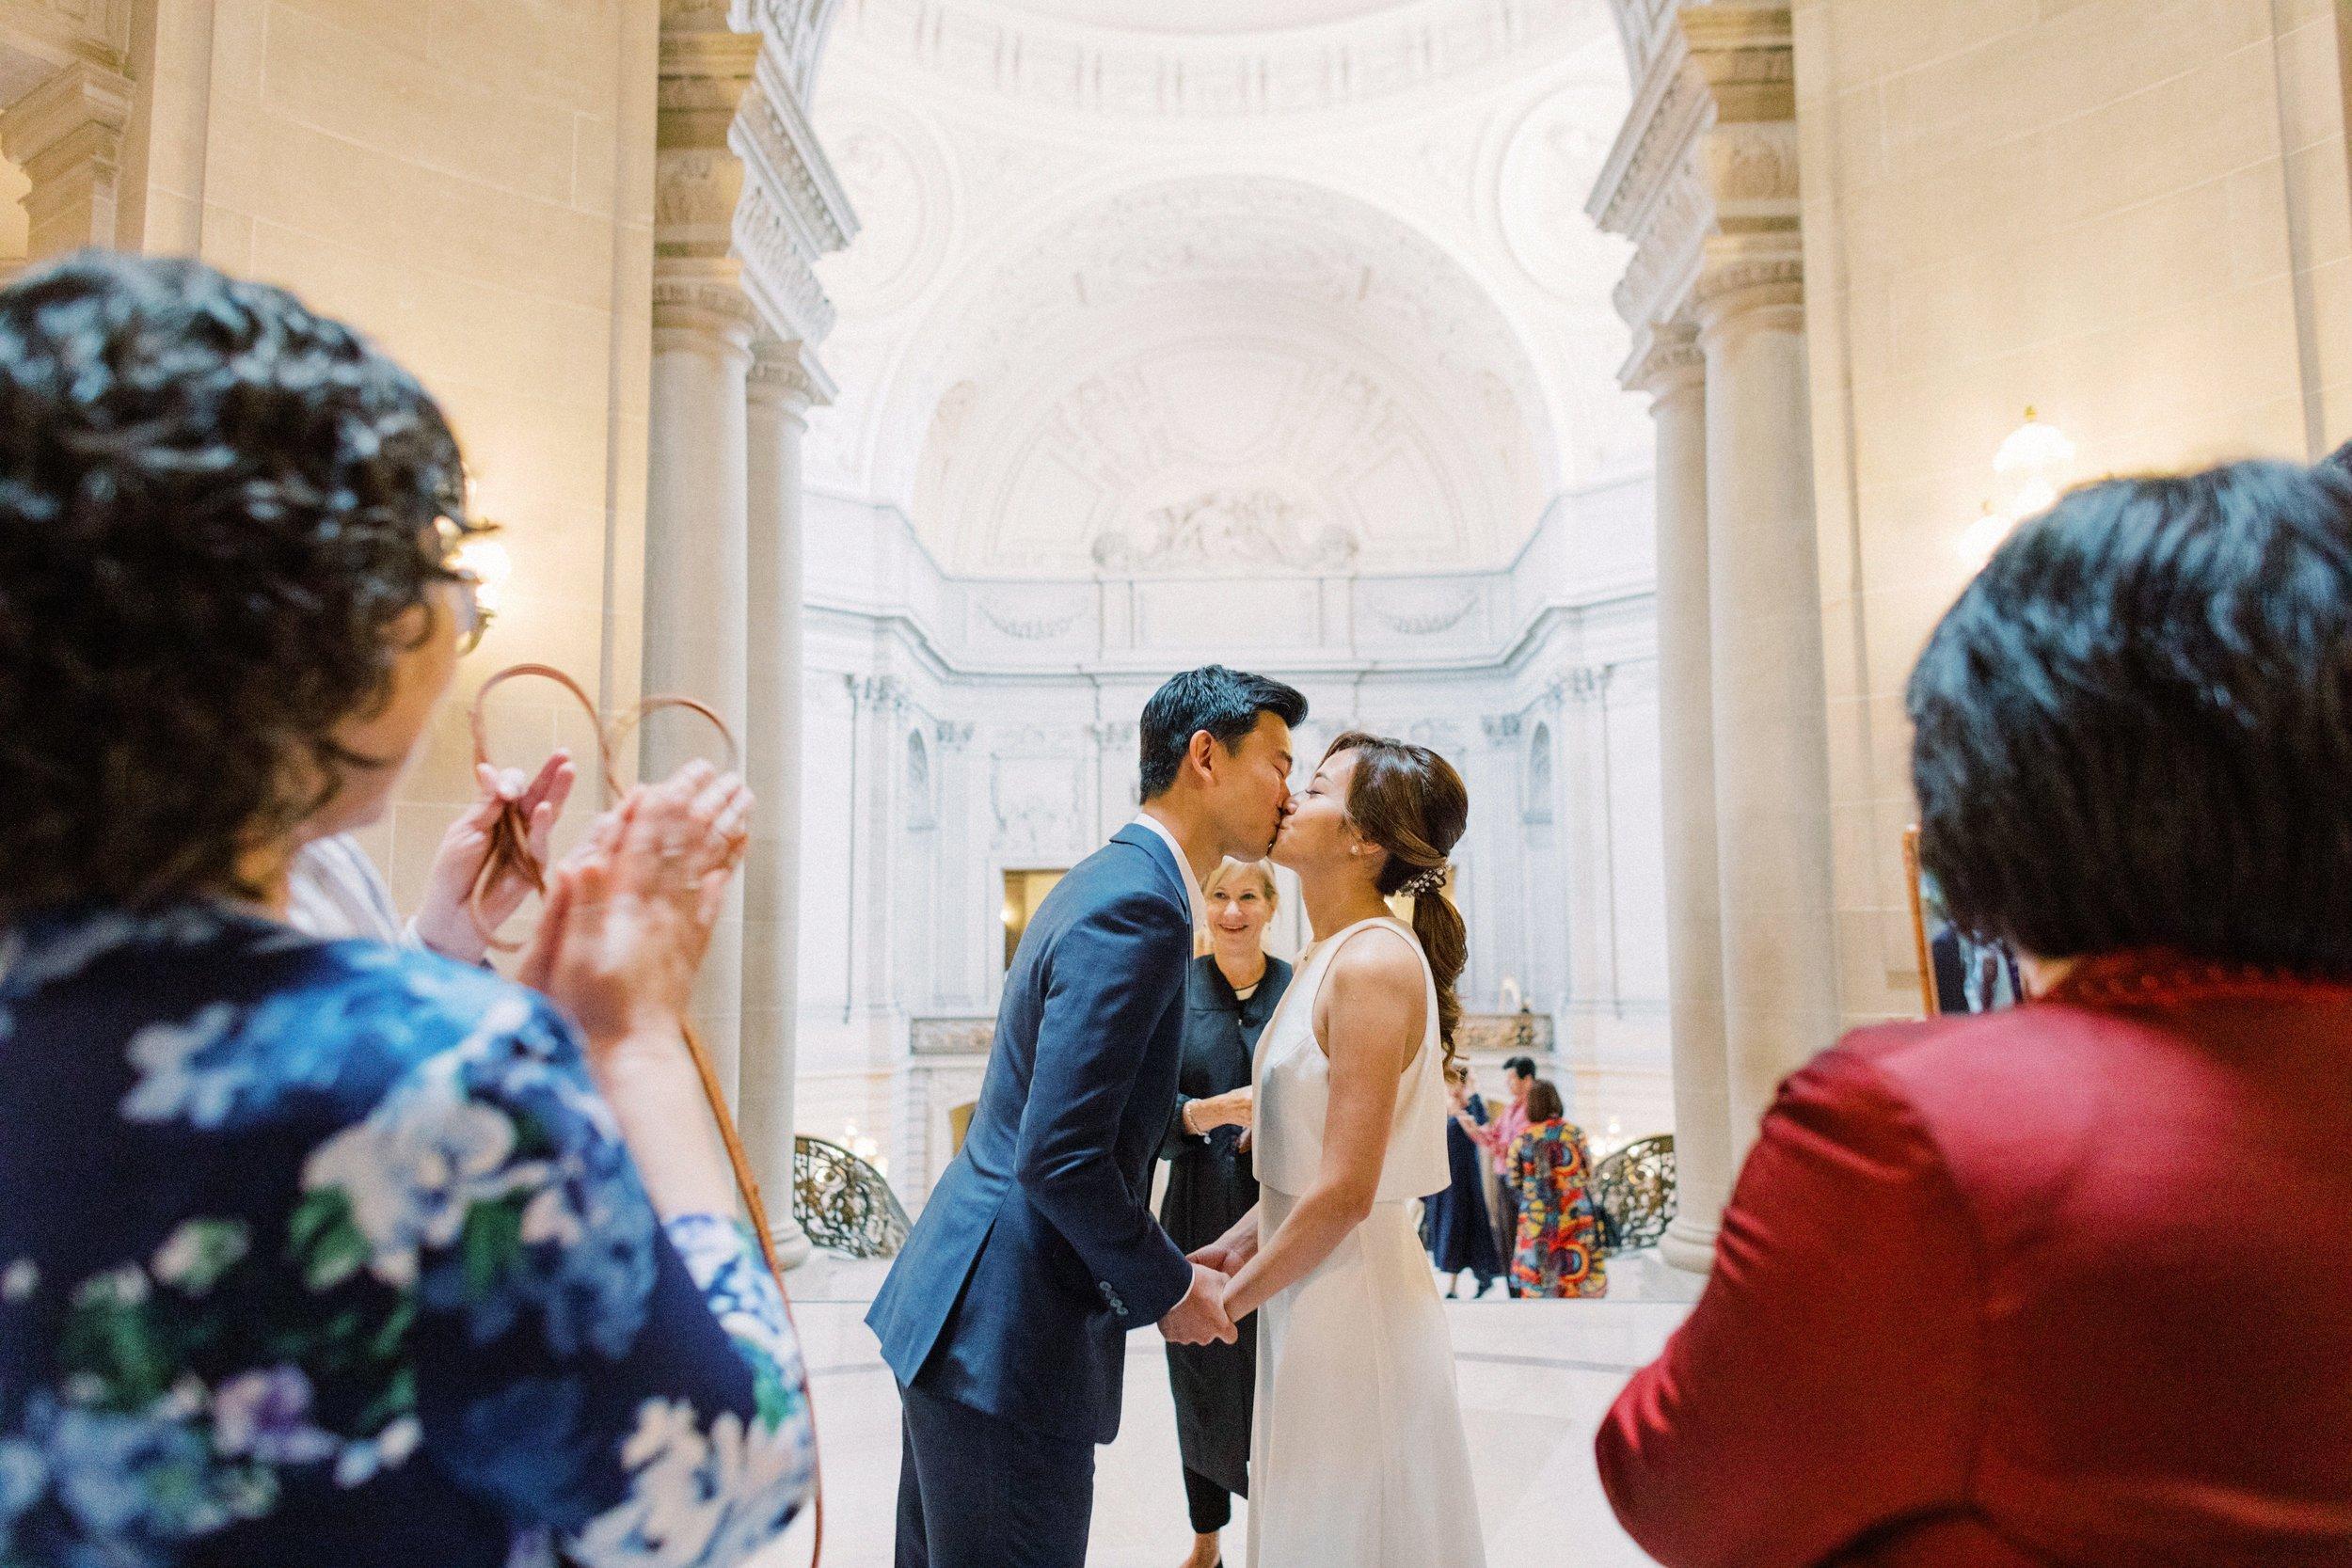 San-francisco-city-hall-photography-wedding-085.jpg